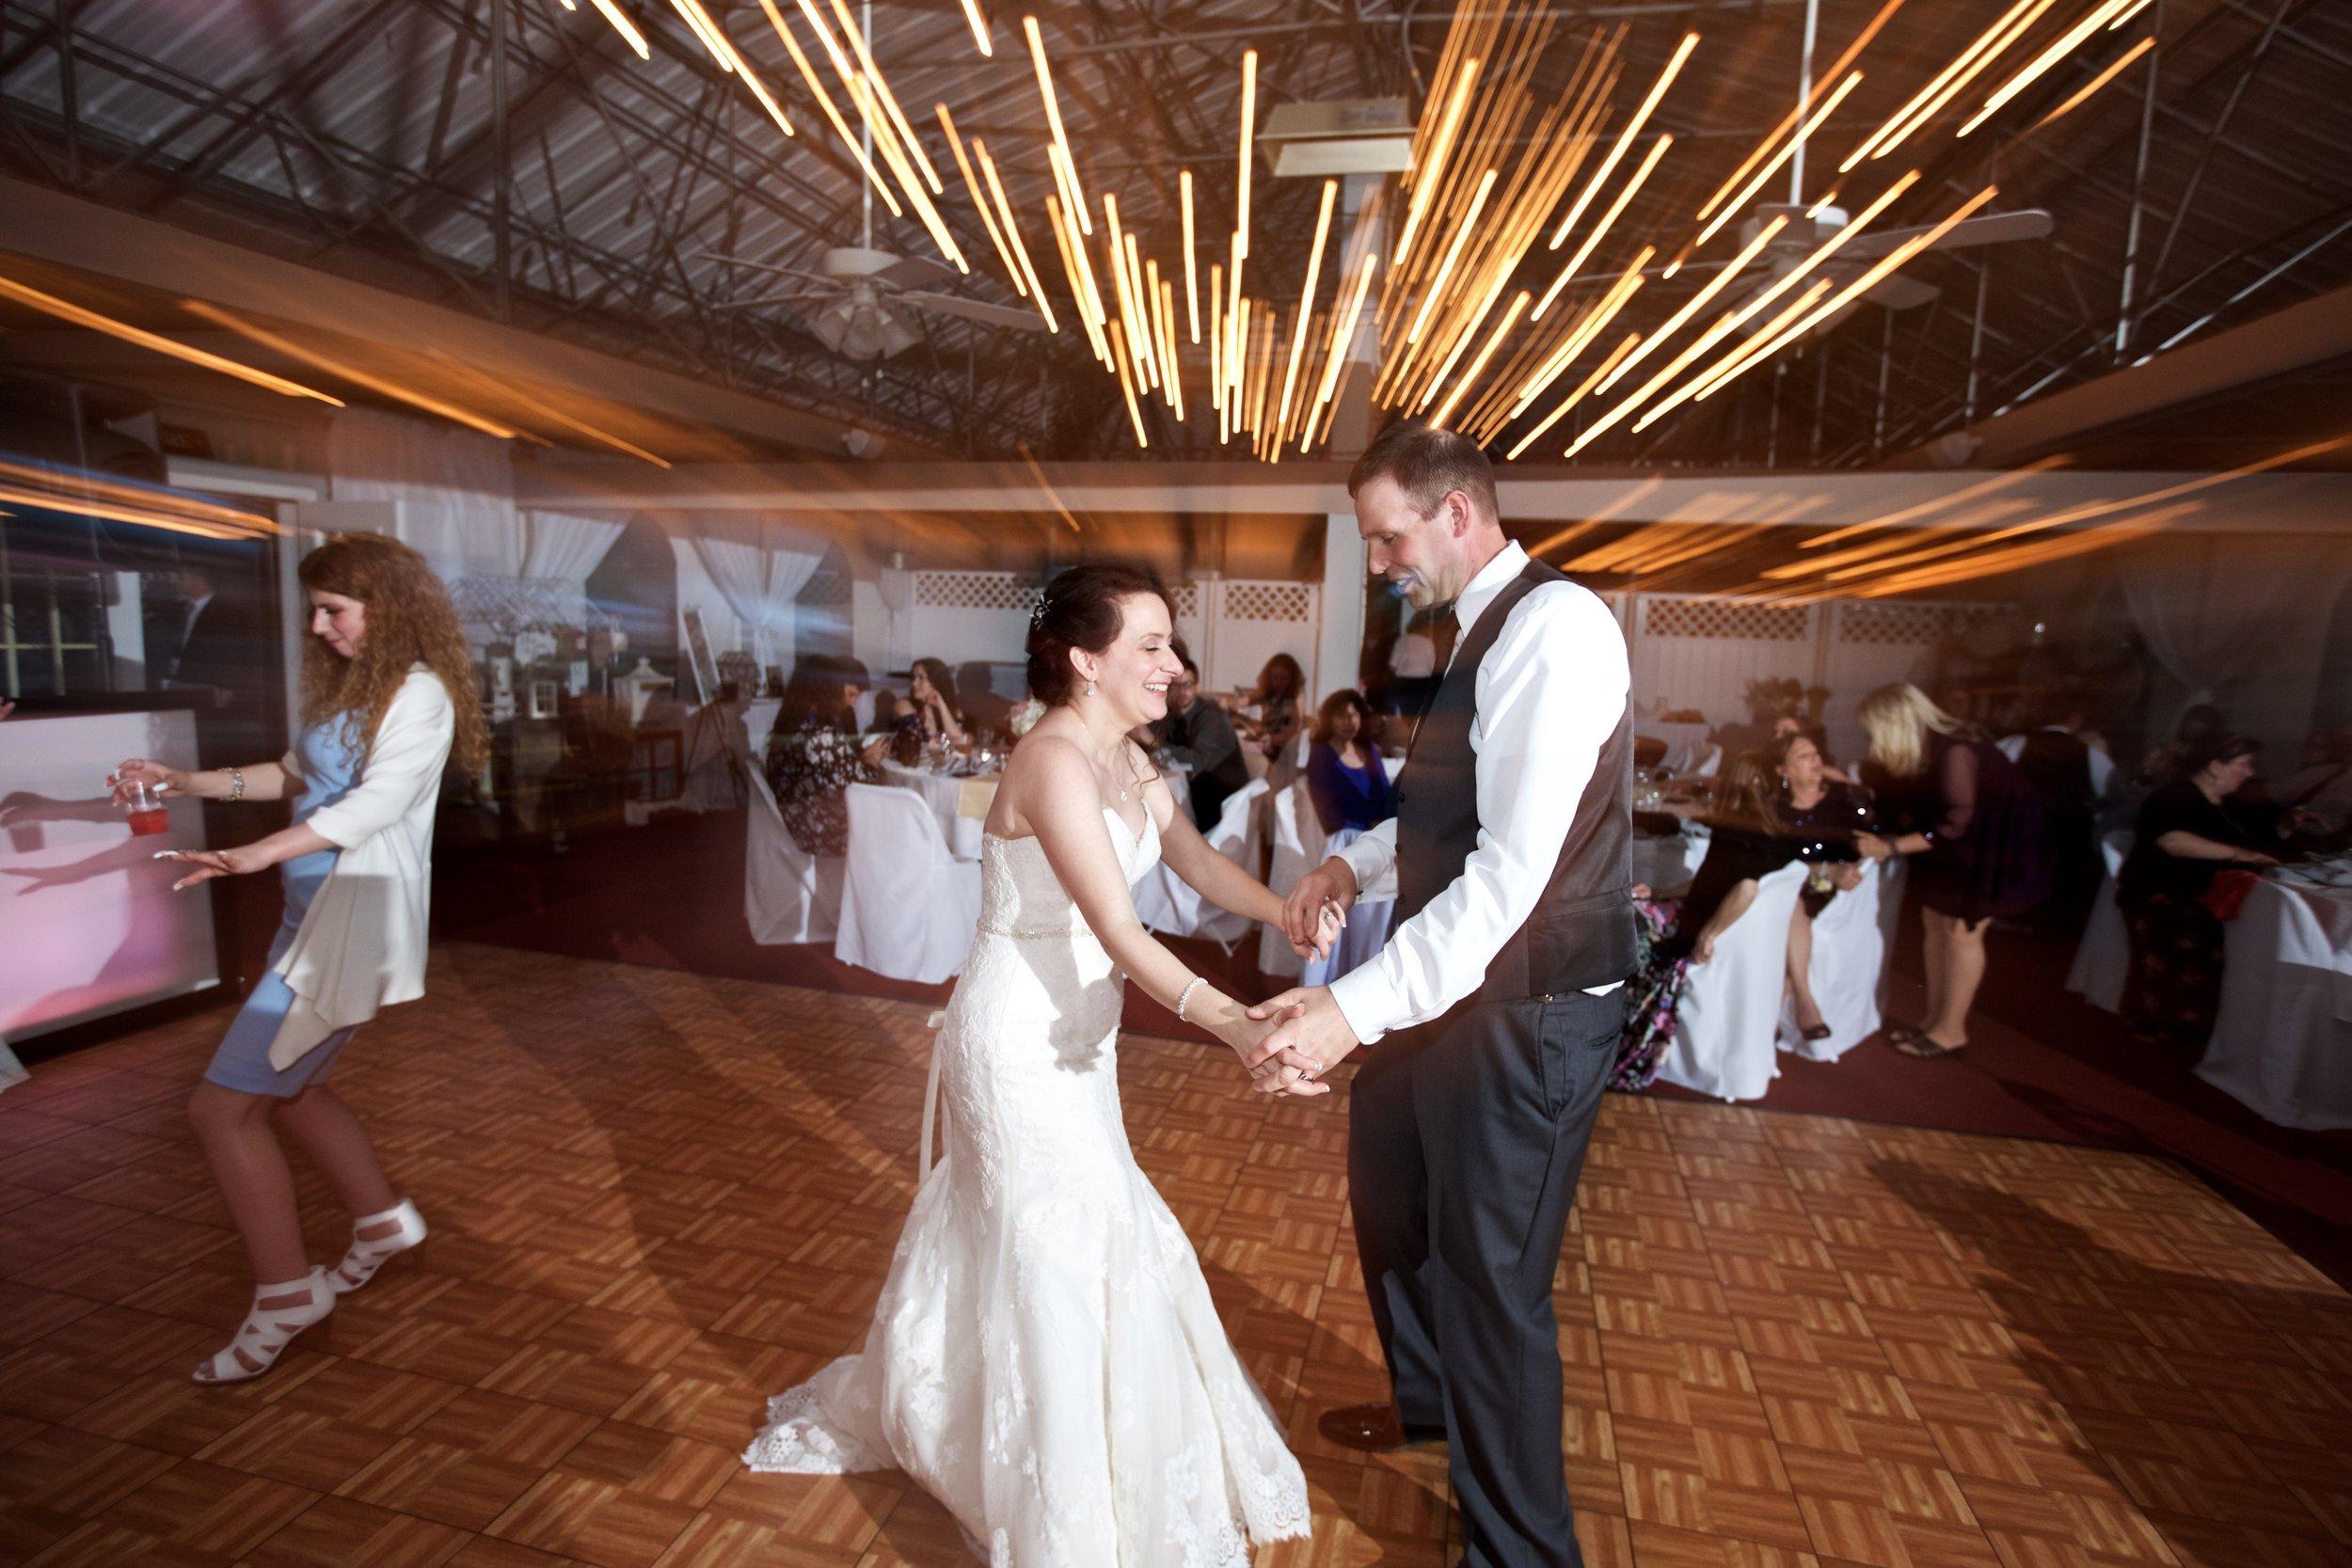 Lippincott manor wedding, wallkill ny wedding, photography, photos aa.jpg